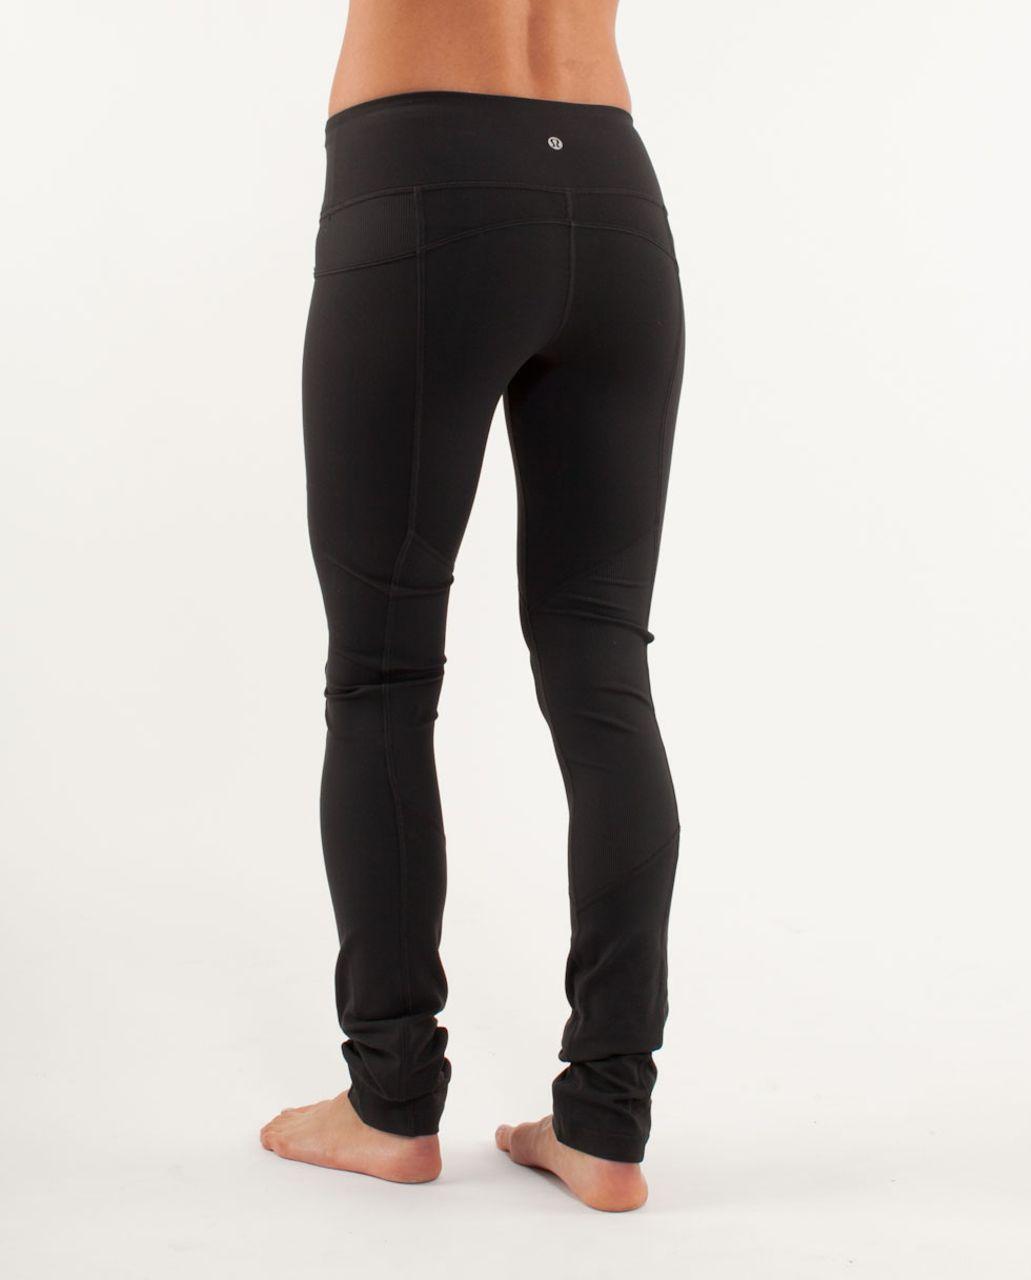 Lululemon Equanimity Pant - Black